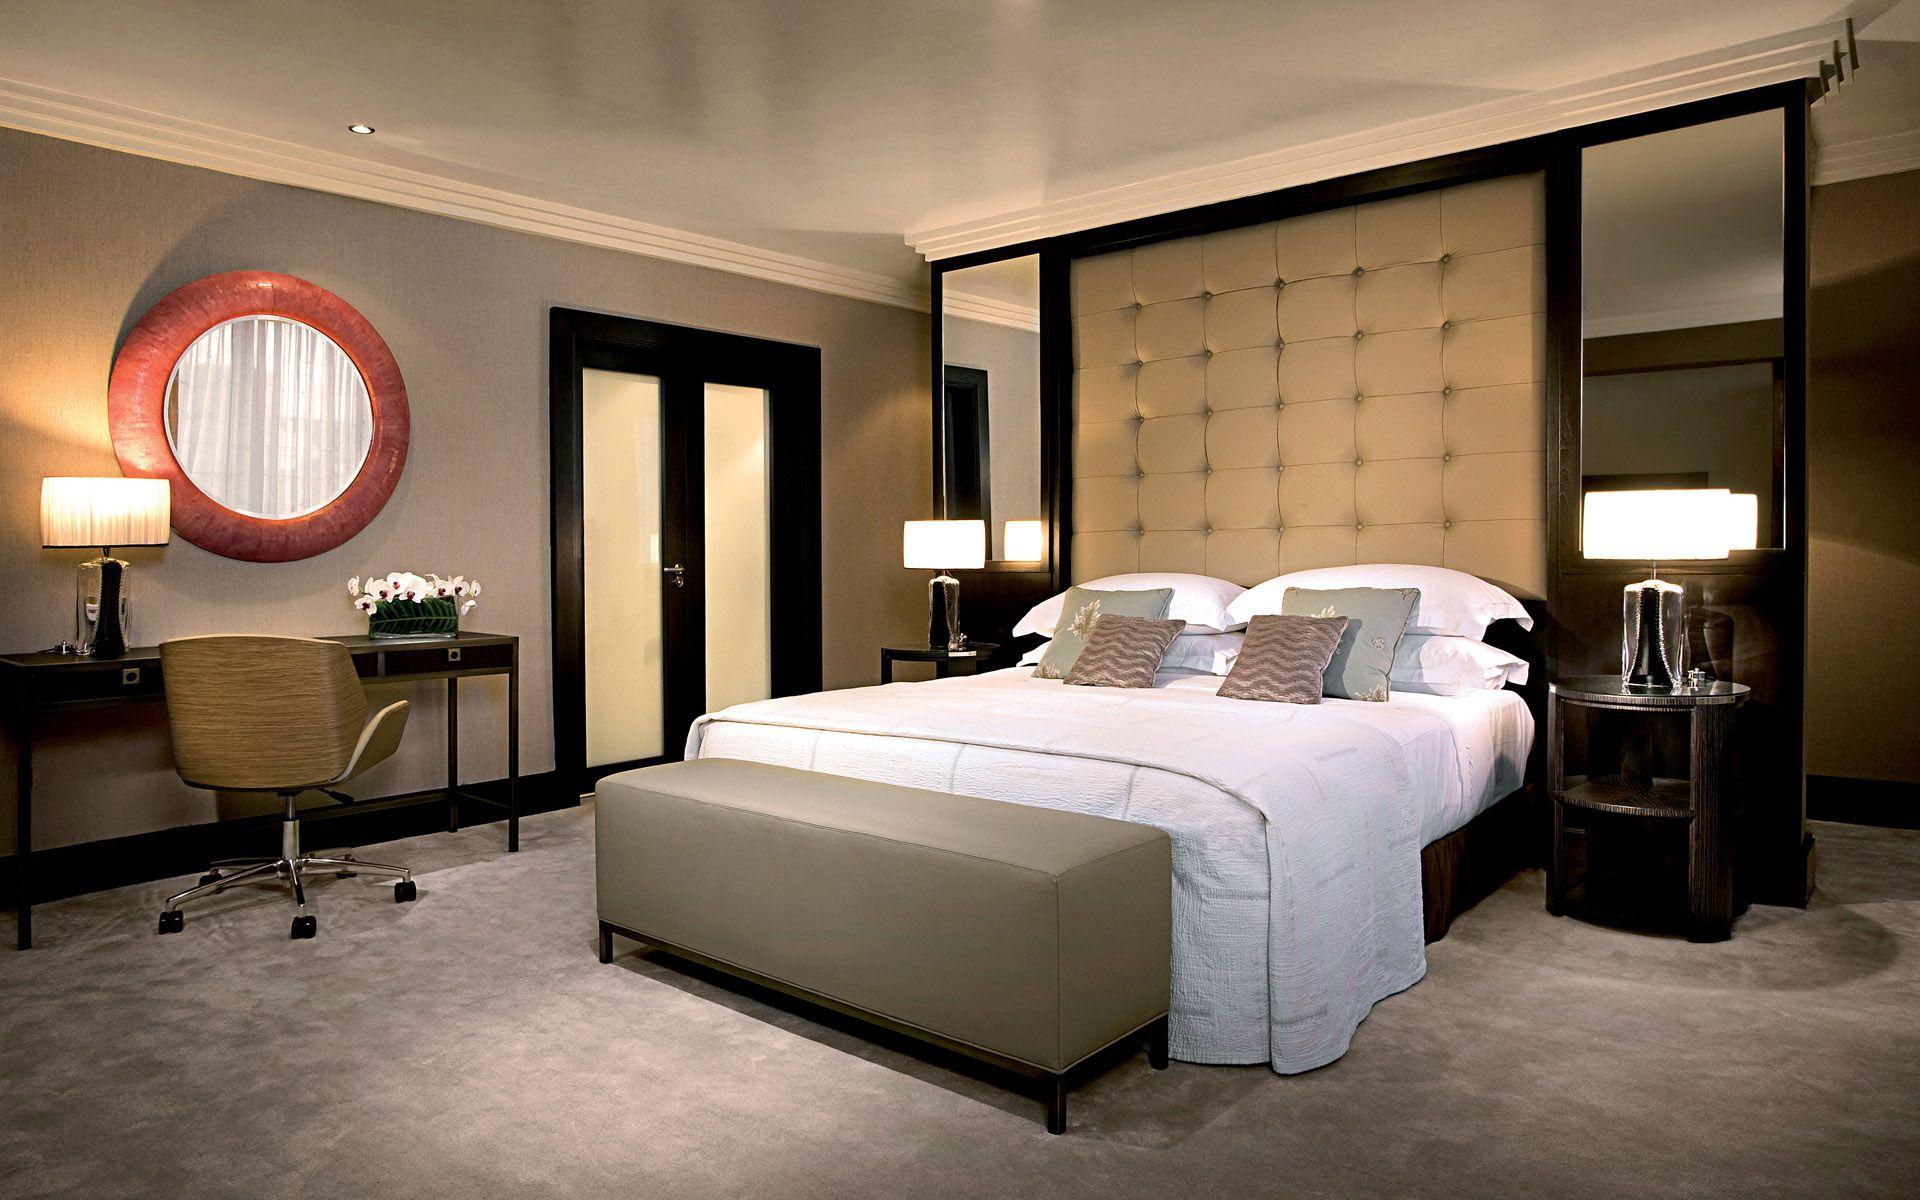 diy ideen schlafzimmer pinterest - Google Търсене   Bedroom ideas ...